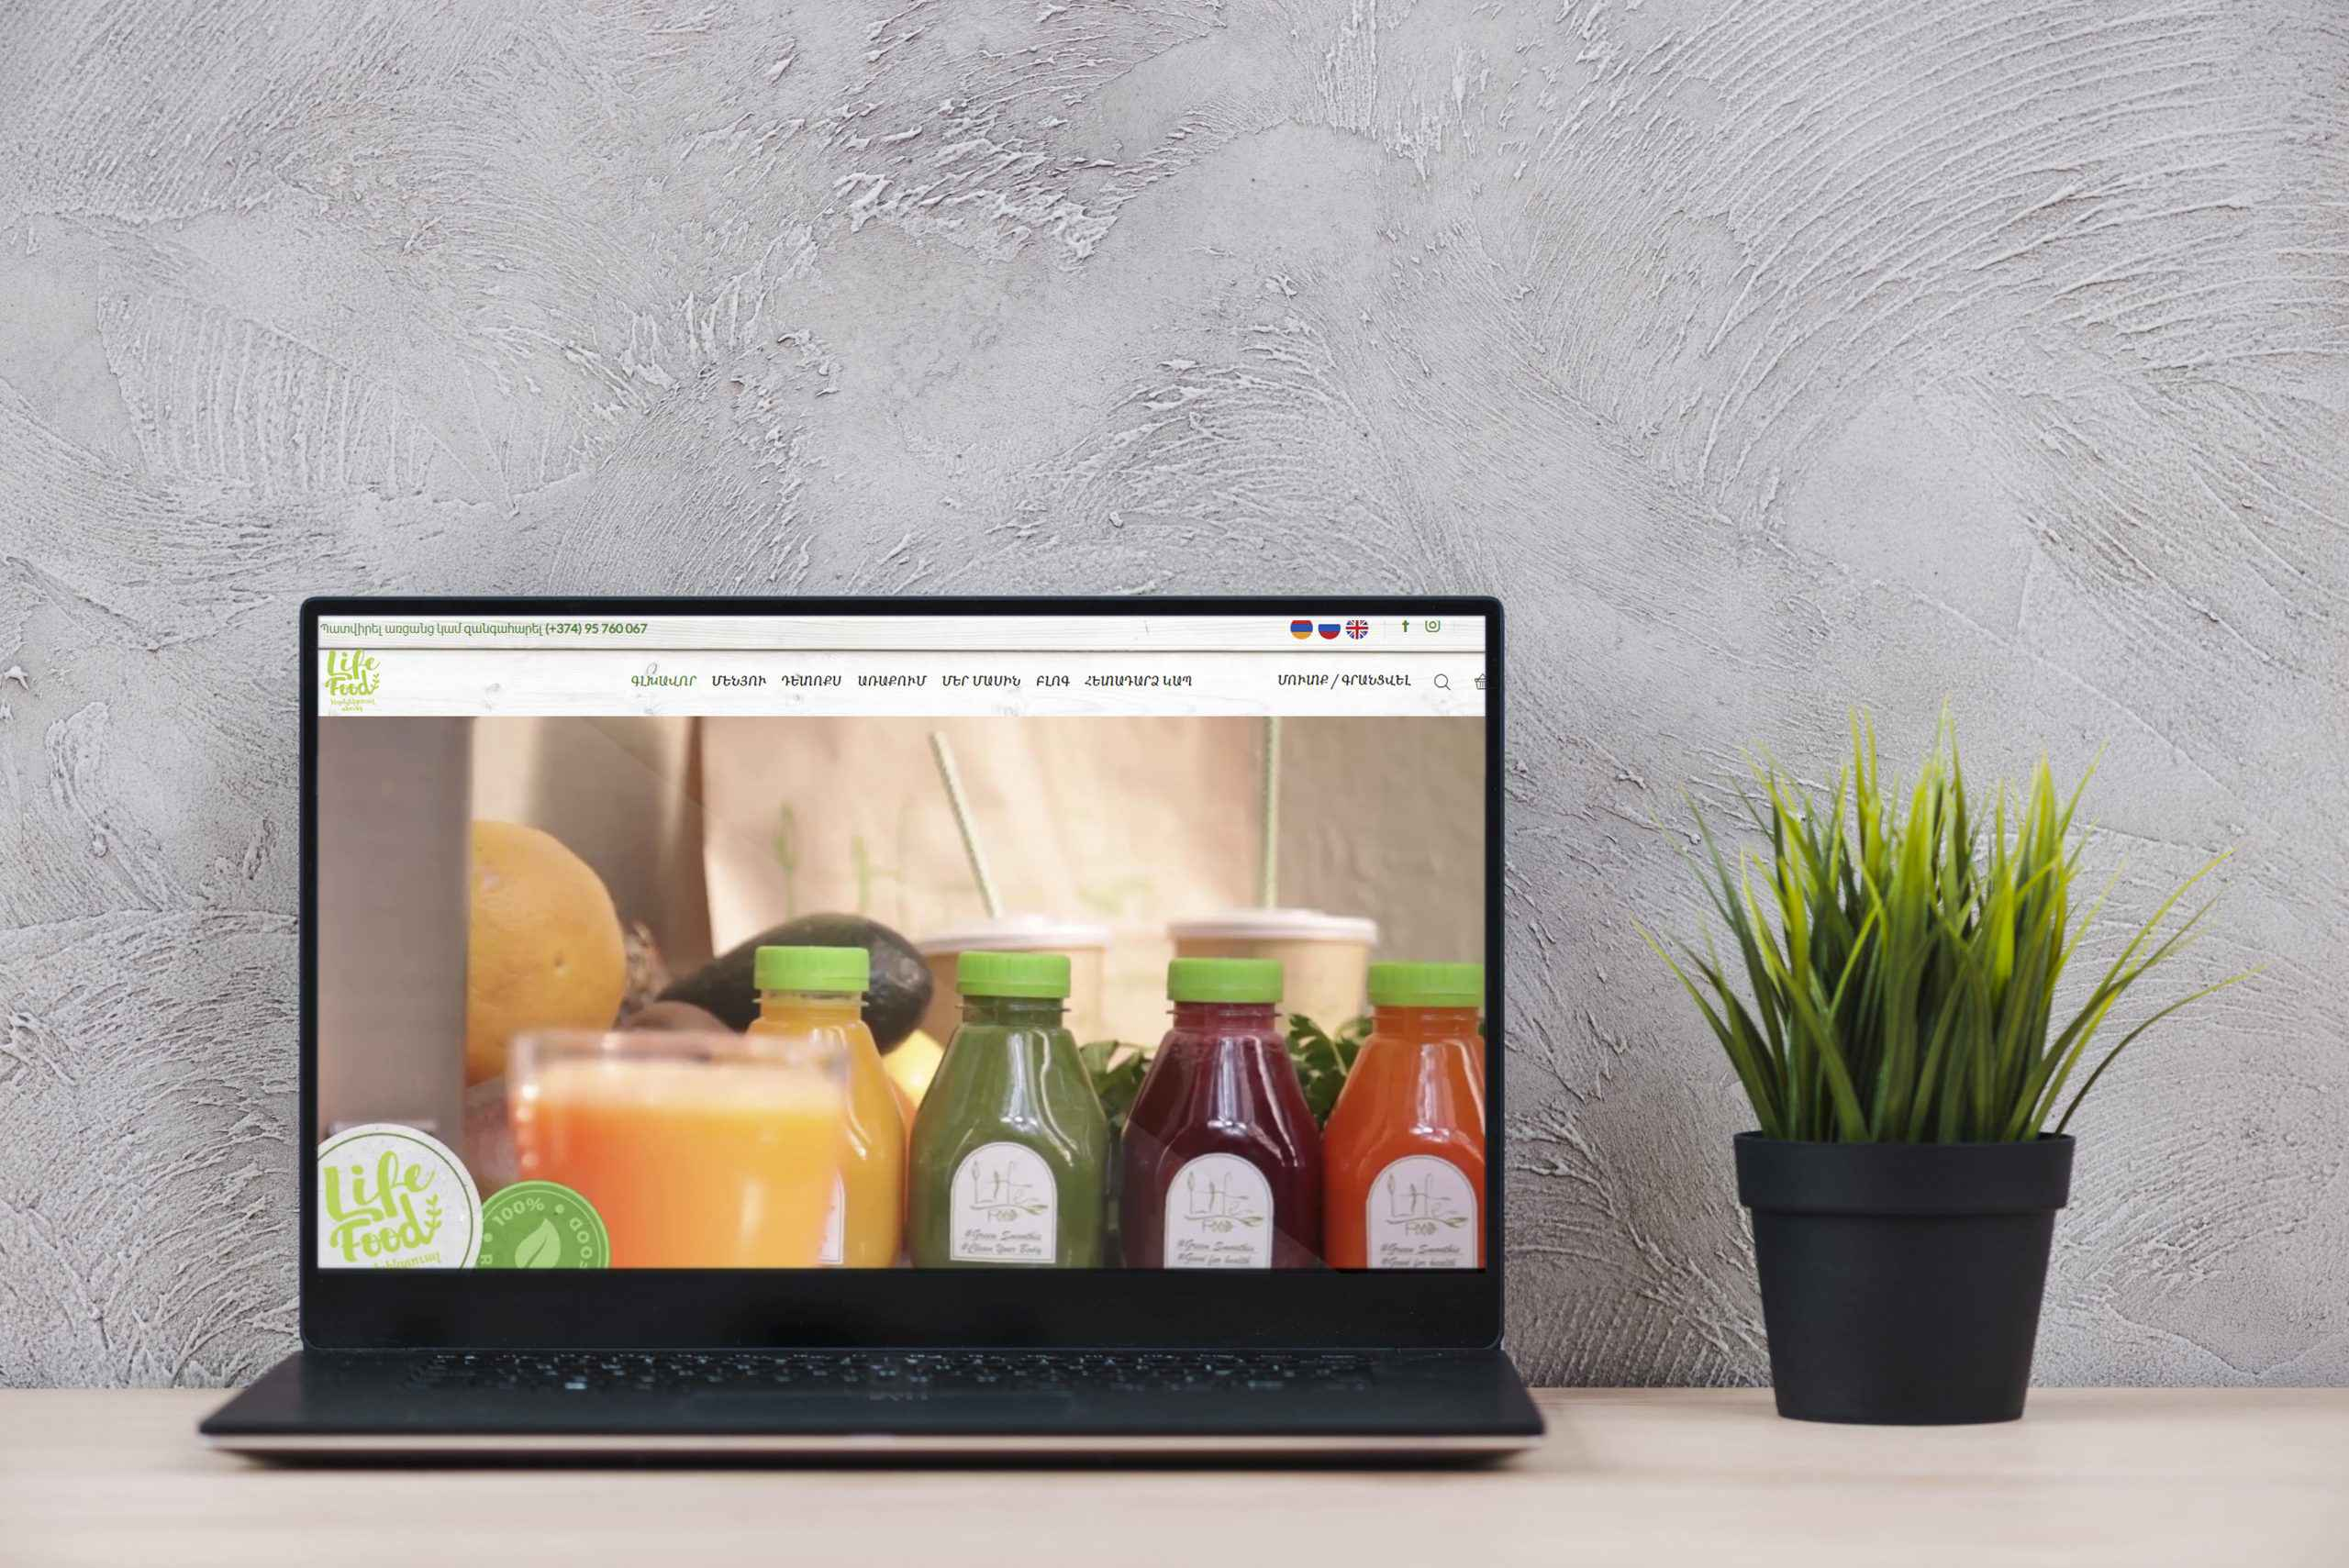 lifefood_mockup_laptop_1-min